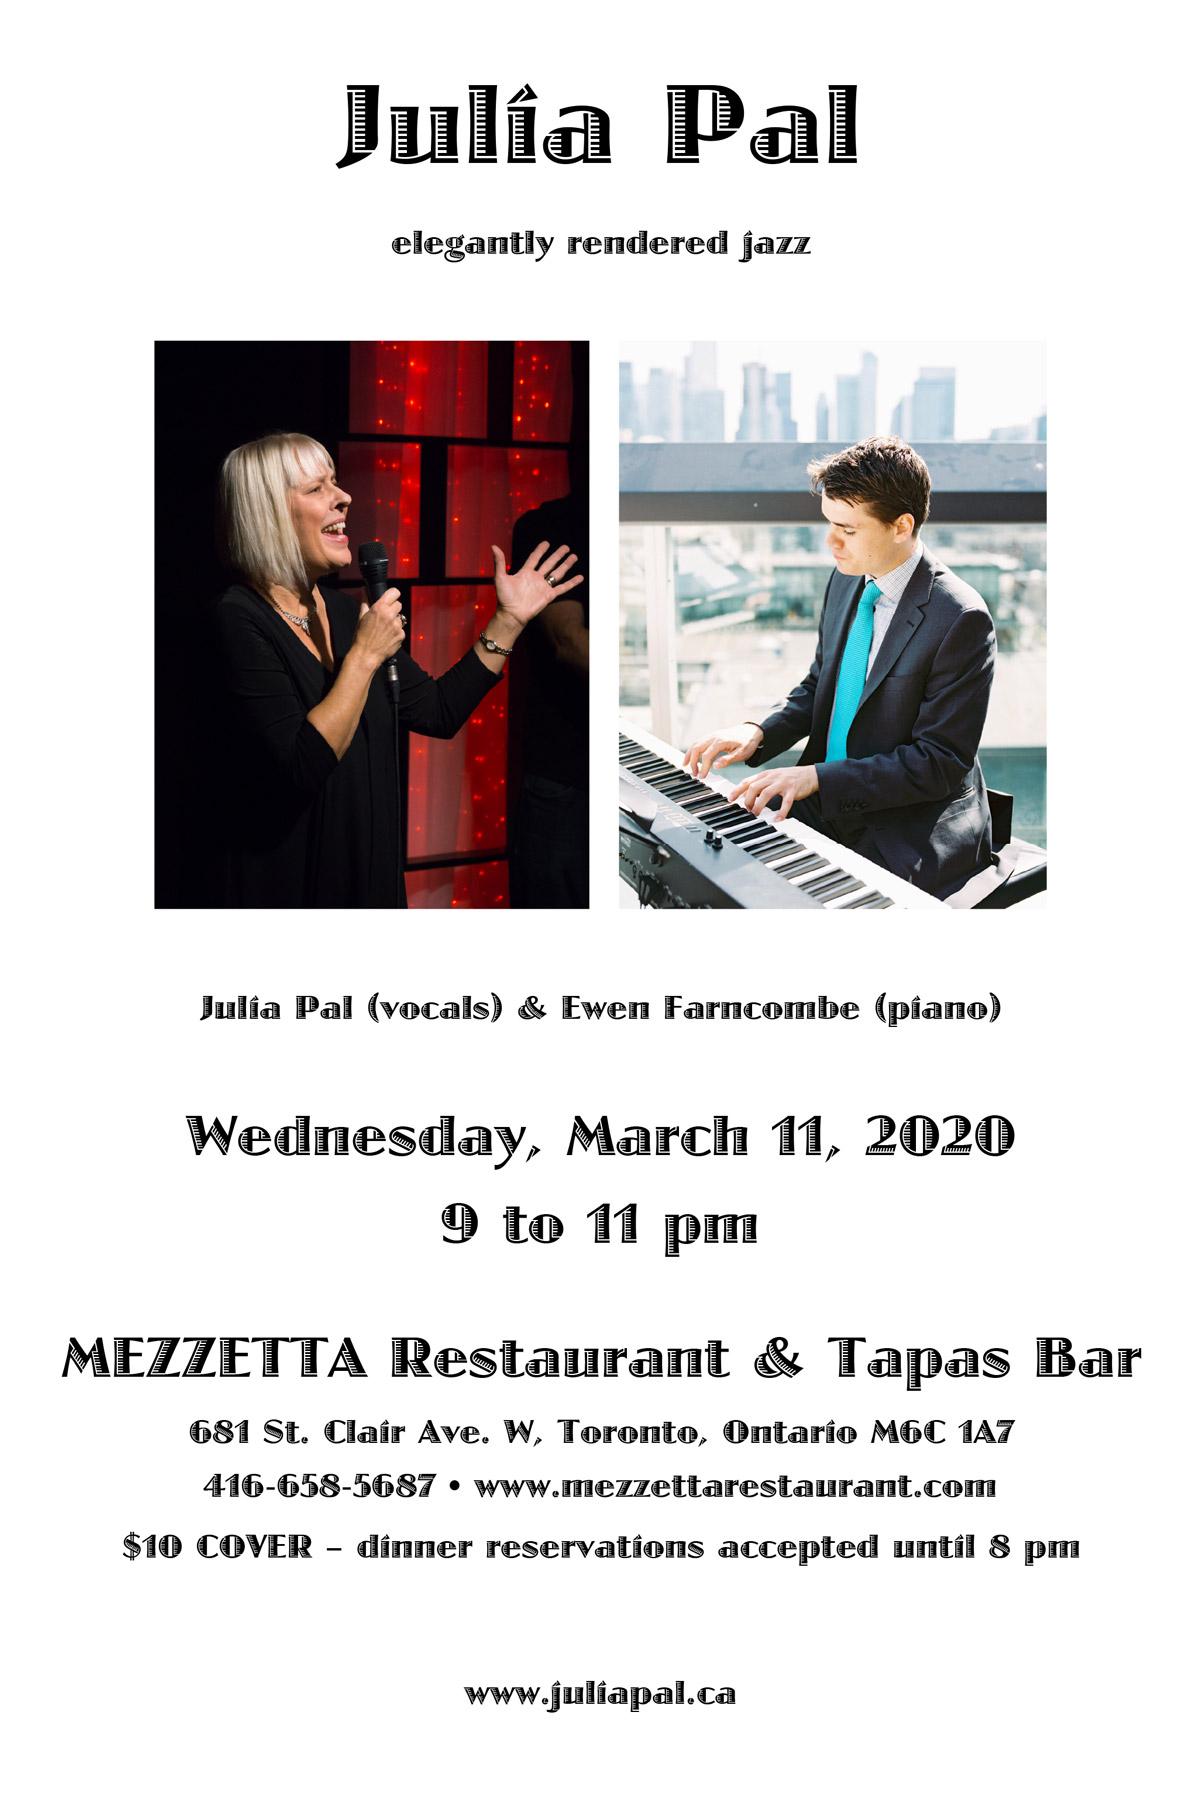 March 11, 2020 - Julia Pal @ Mezzetta